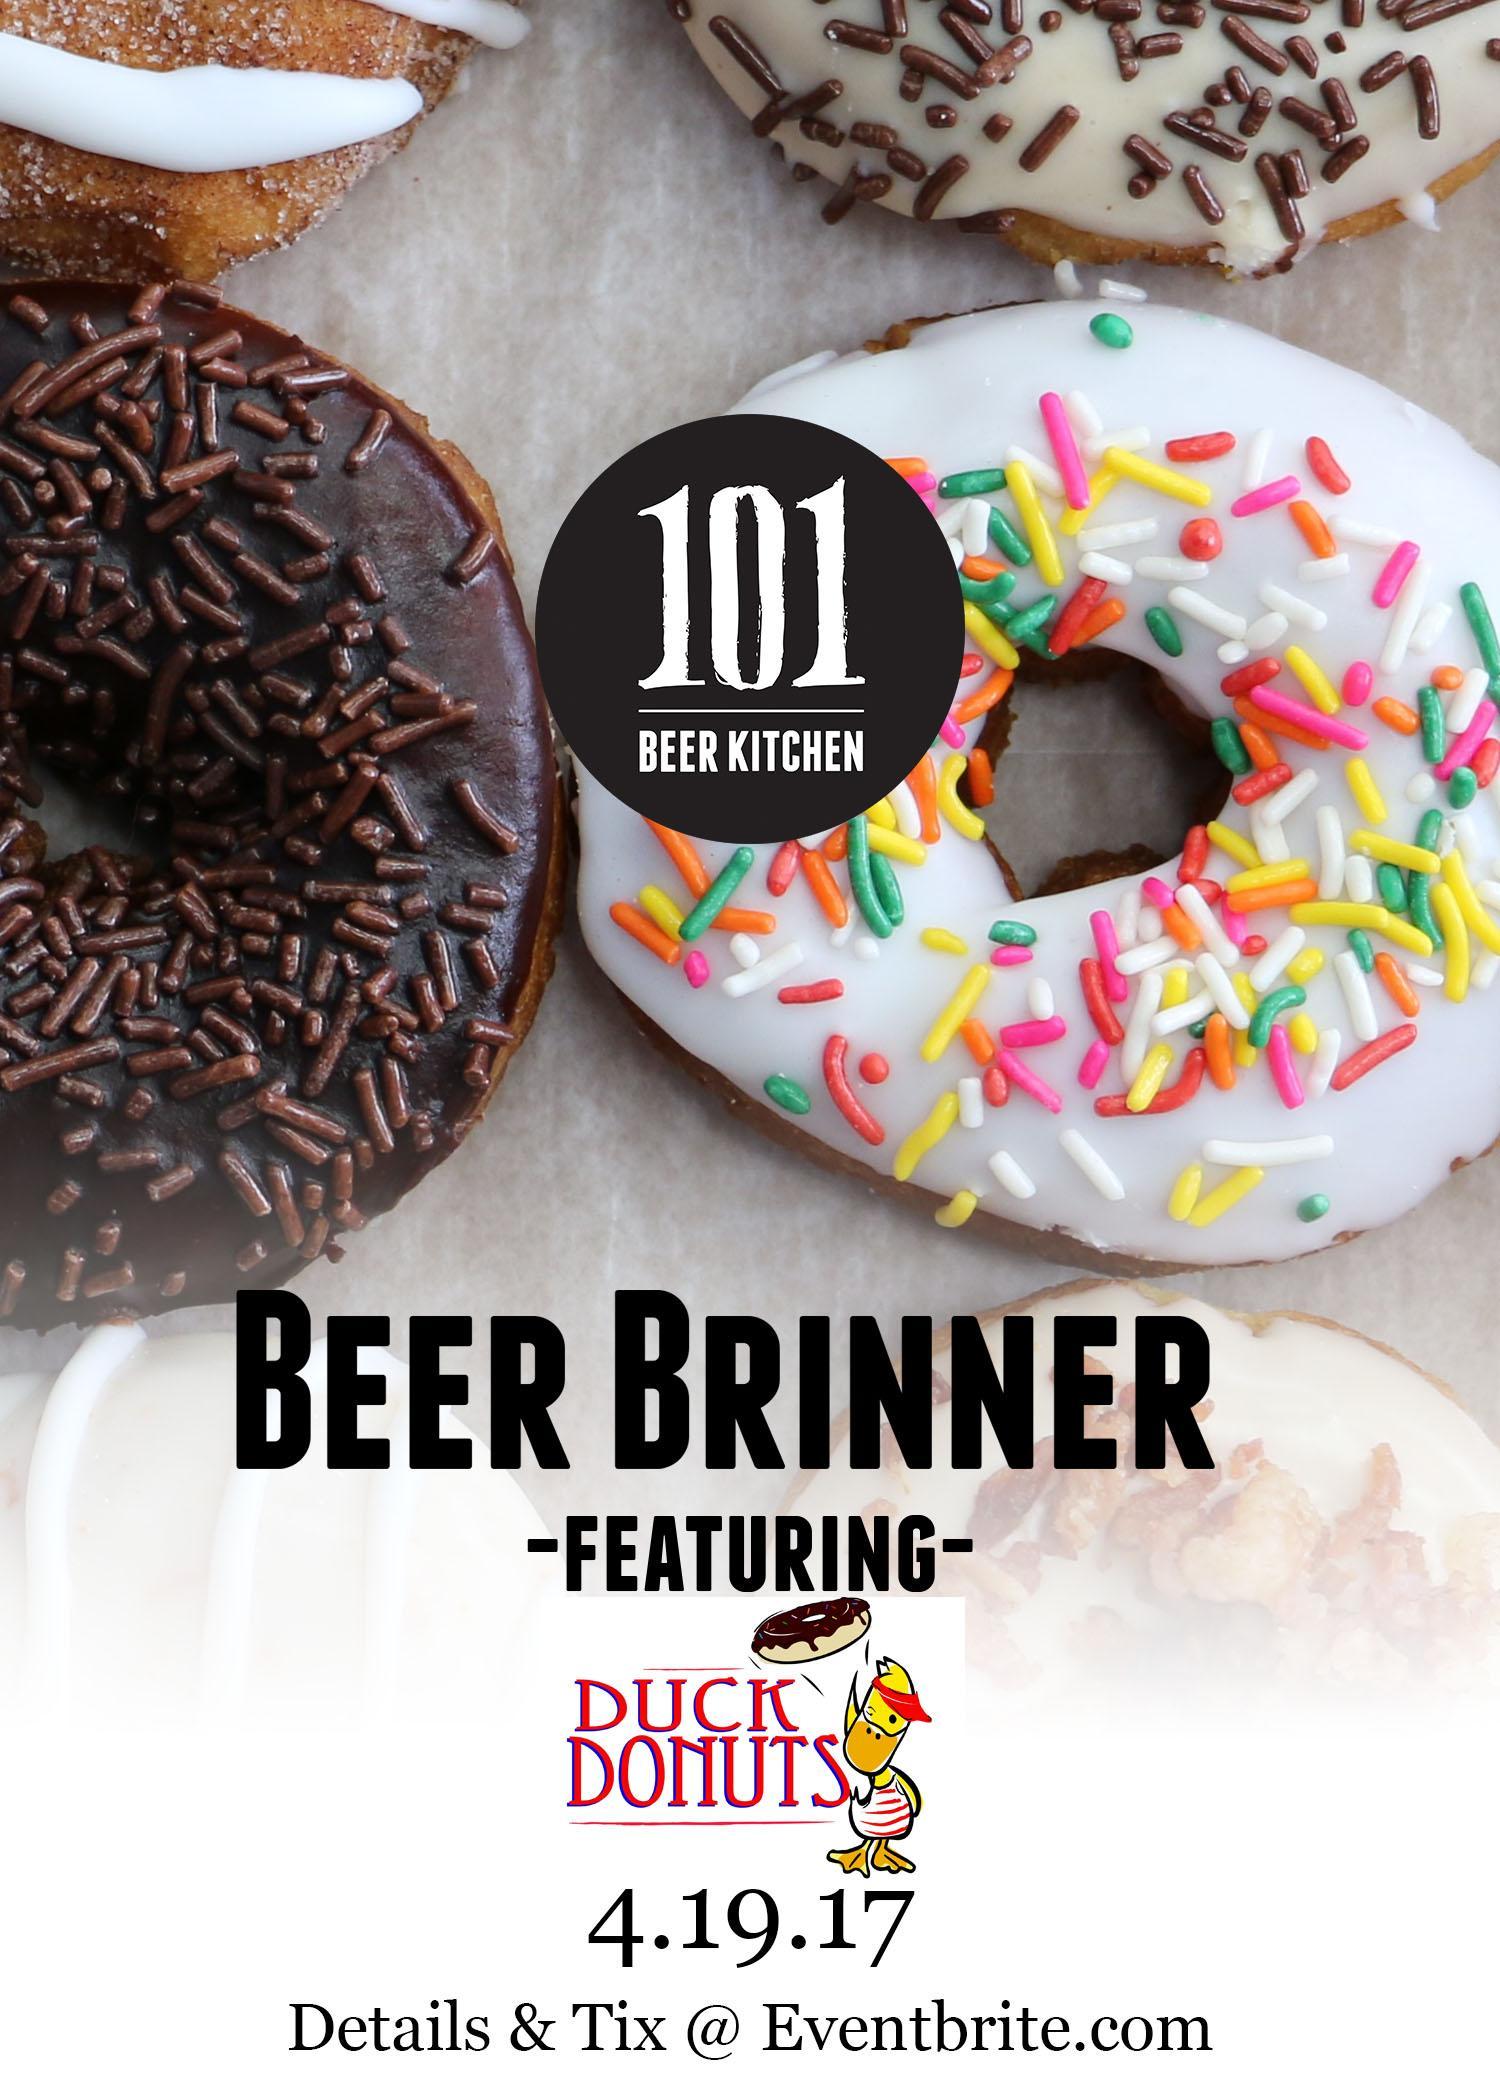 Beer Brinner! Featuring Duck Donuts @ 101 Beer Kitchen, Dublin ...